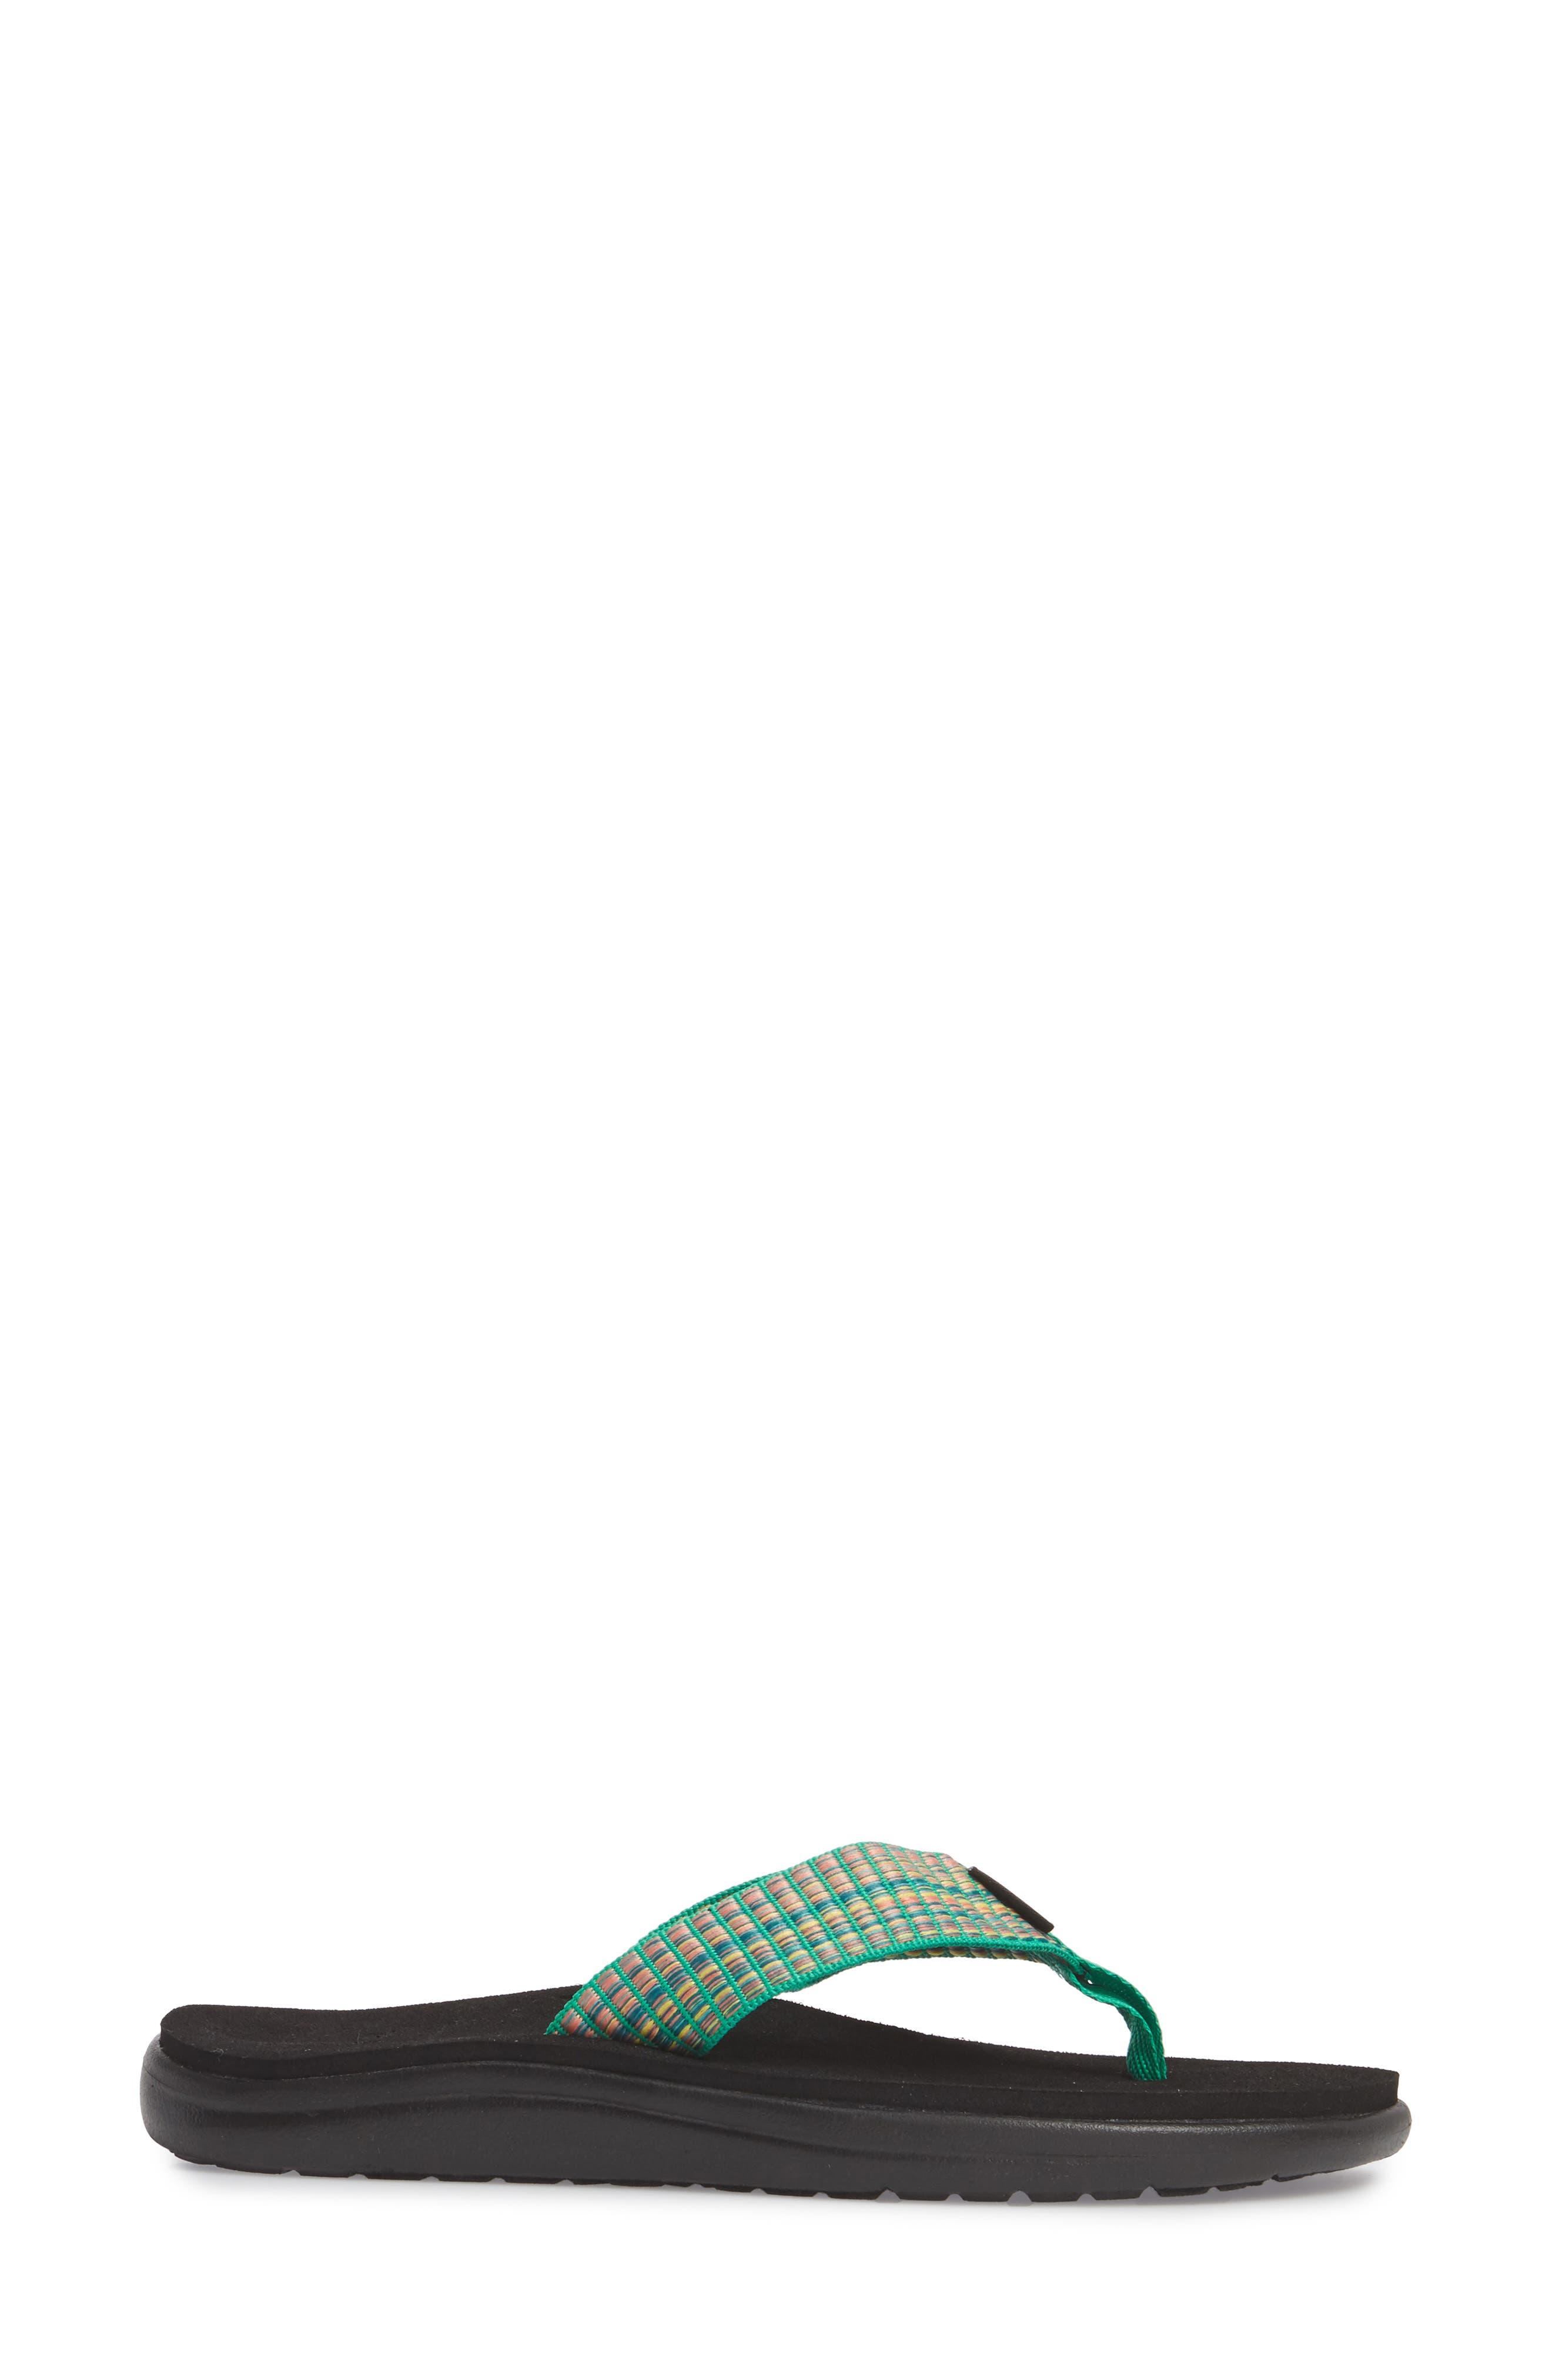 Voya Flip Flop,                             Alternate thumbnail 3, color,                             BAR STREET MULTI FERN FABRIC